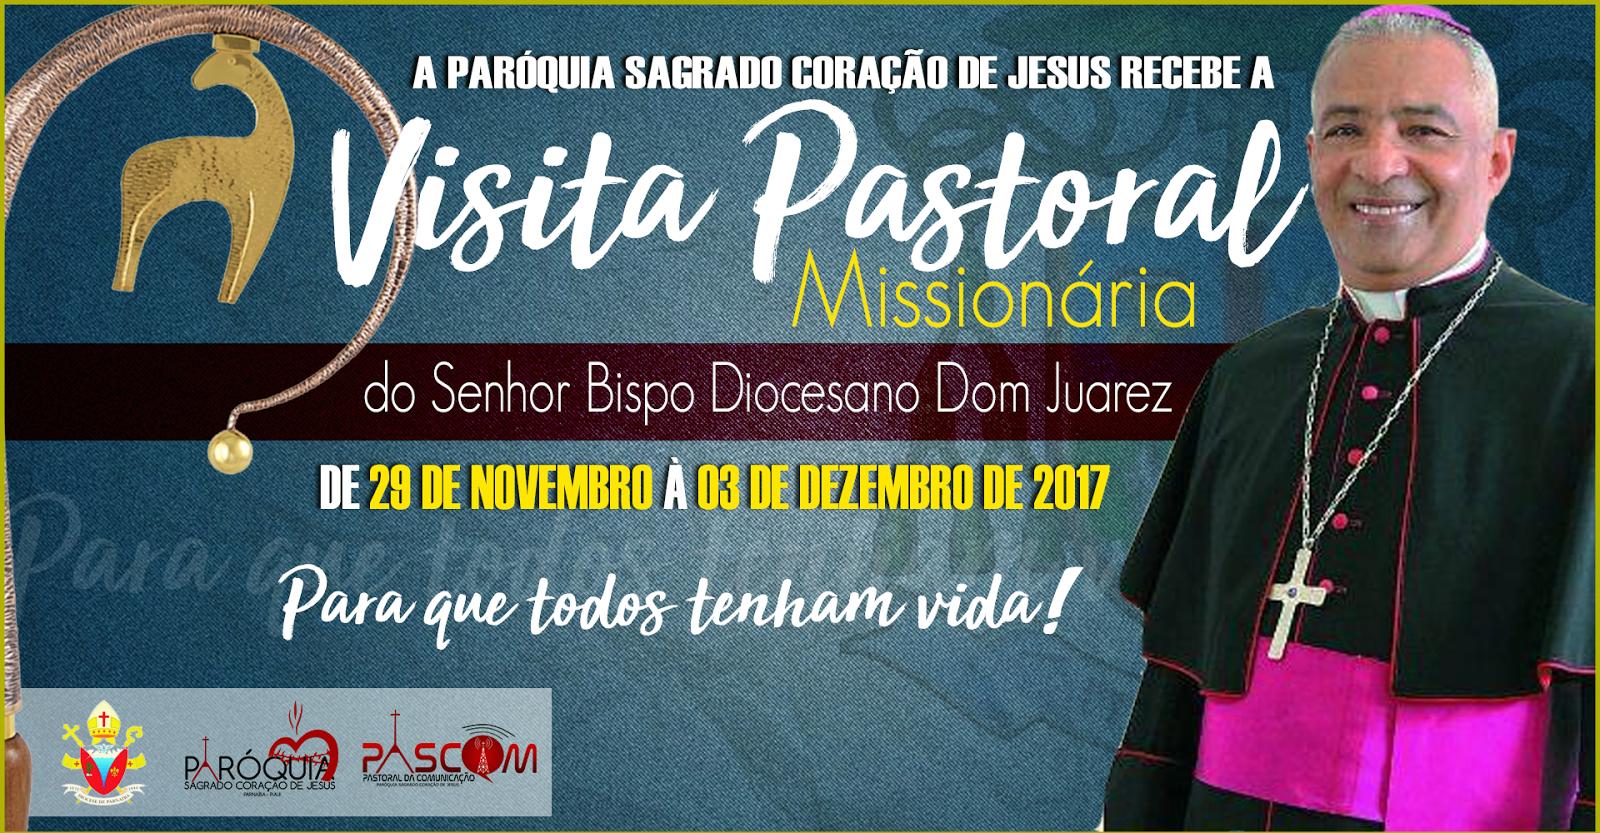 VISITA PASTORAL DE DOM JUAREZ